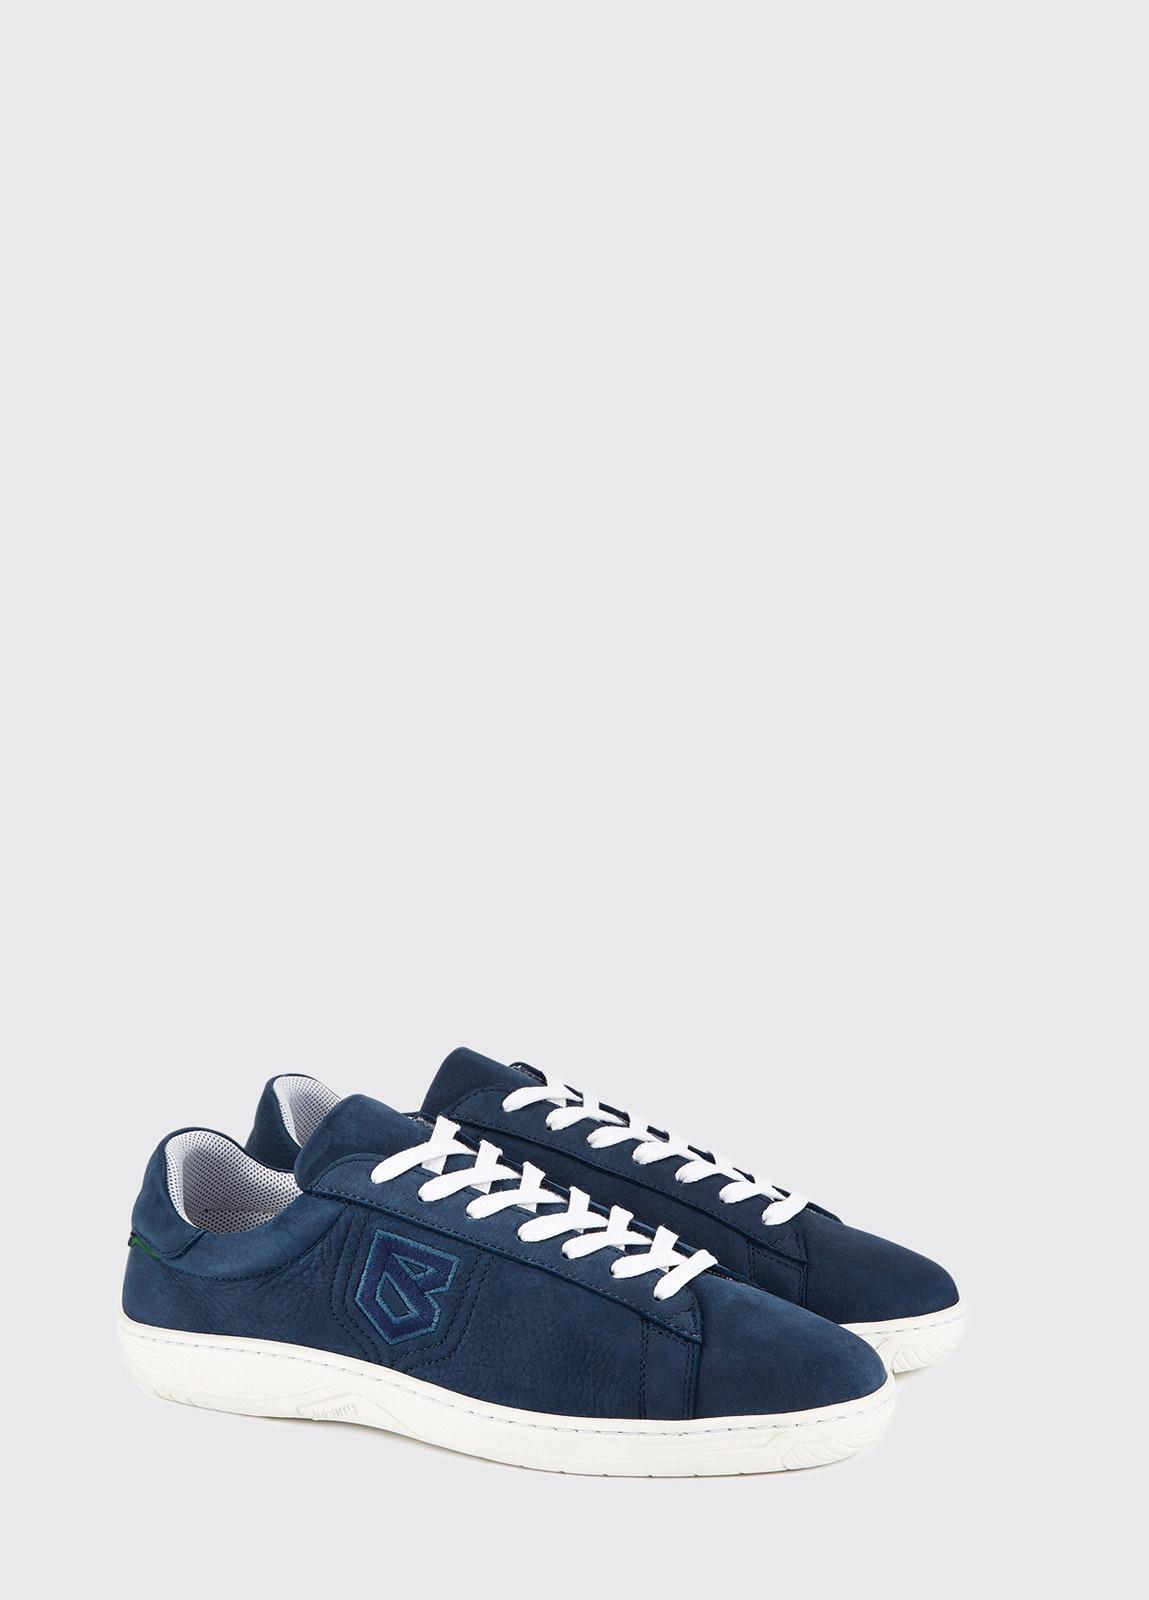 Portofino Deck Shoe - Denim